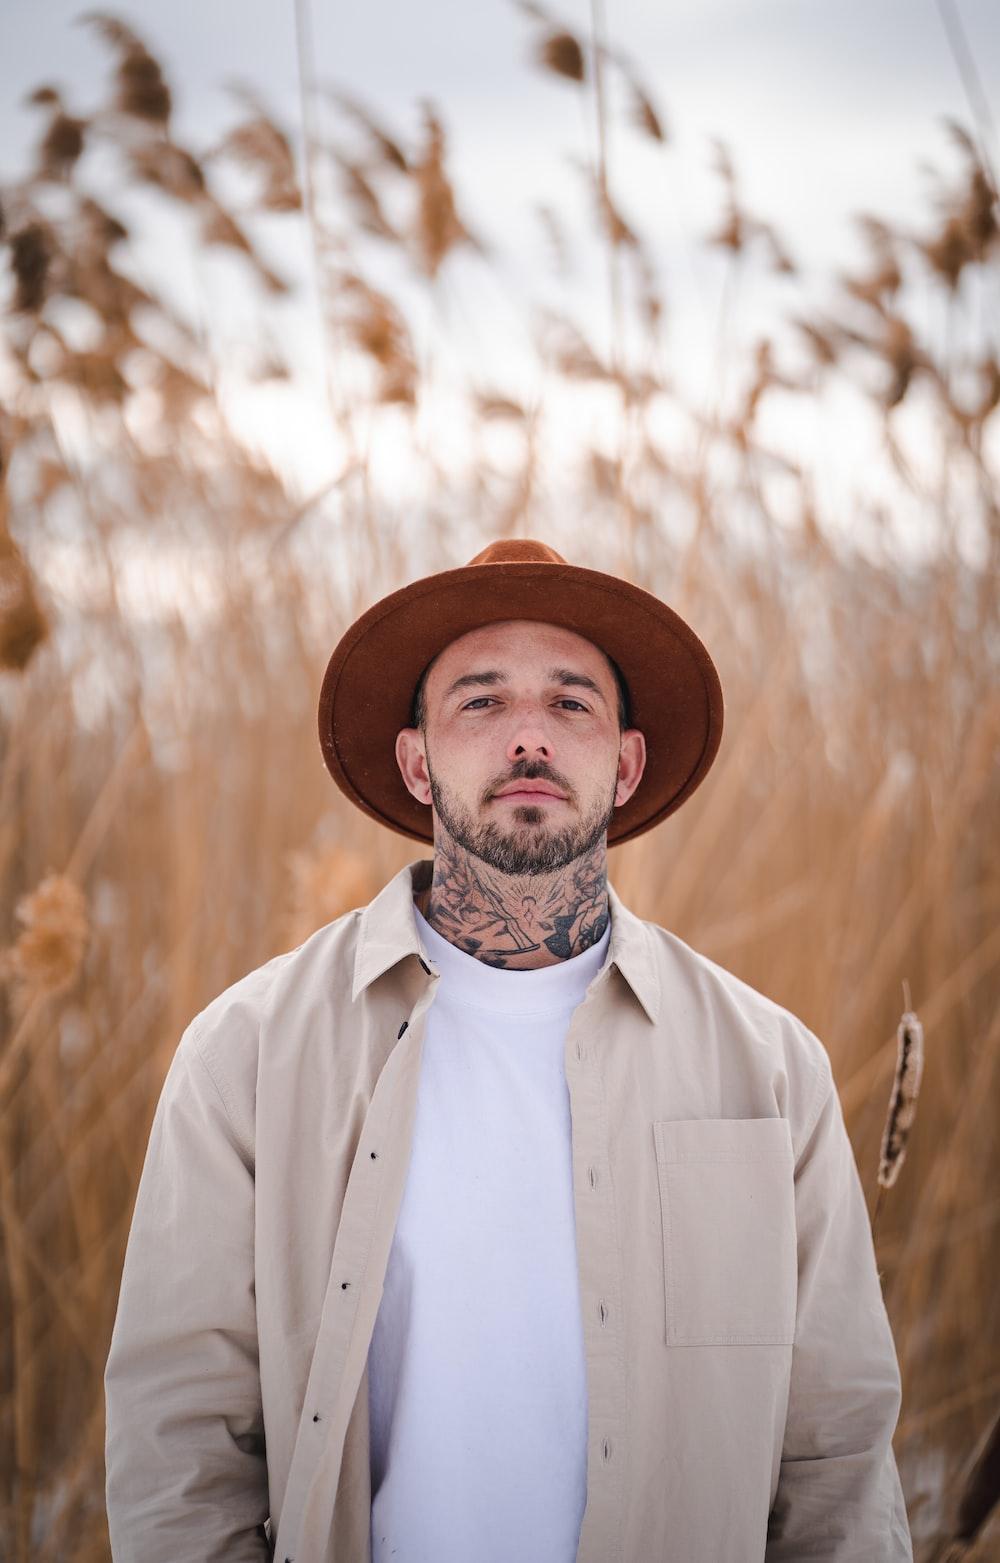 man in white button up shirt wearing brown hat